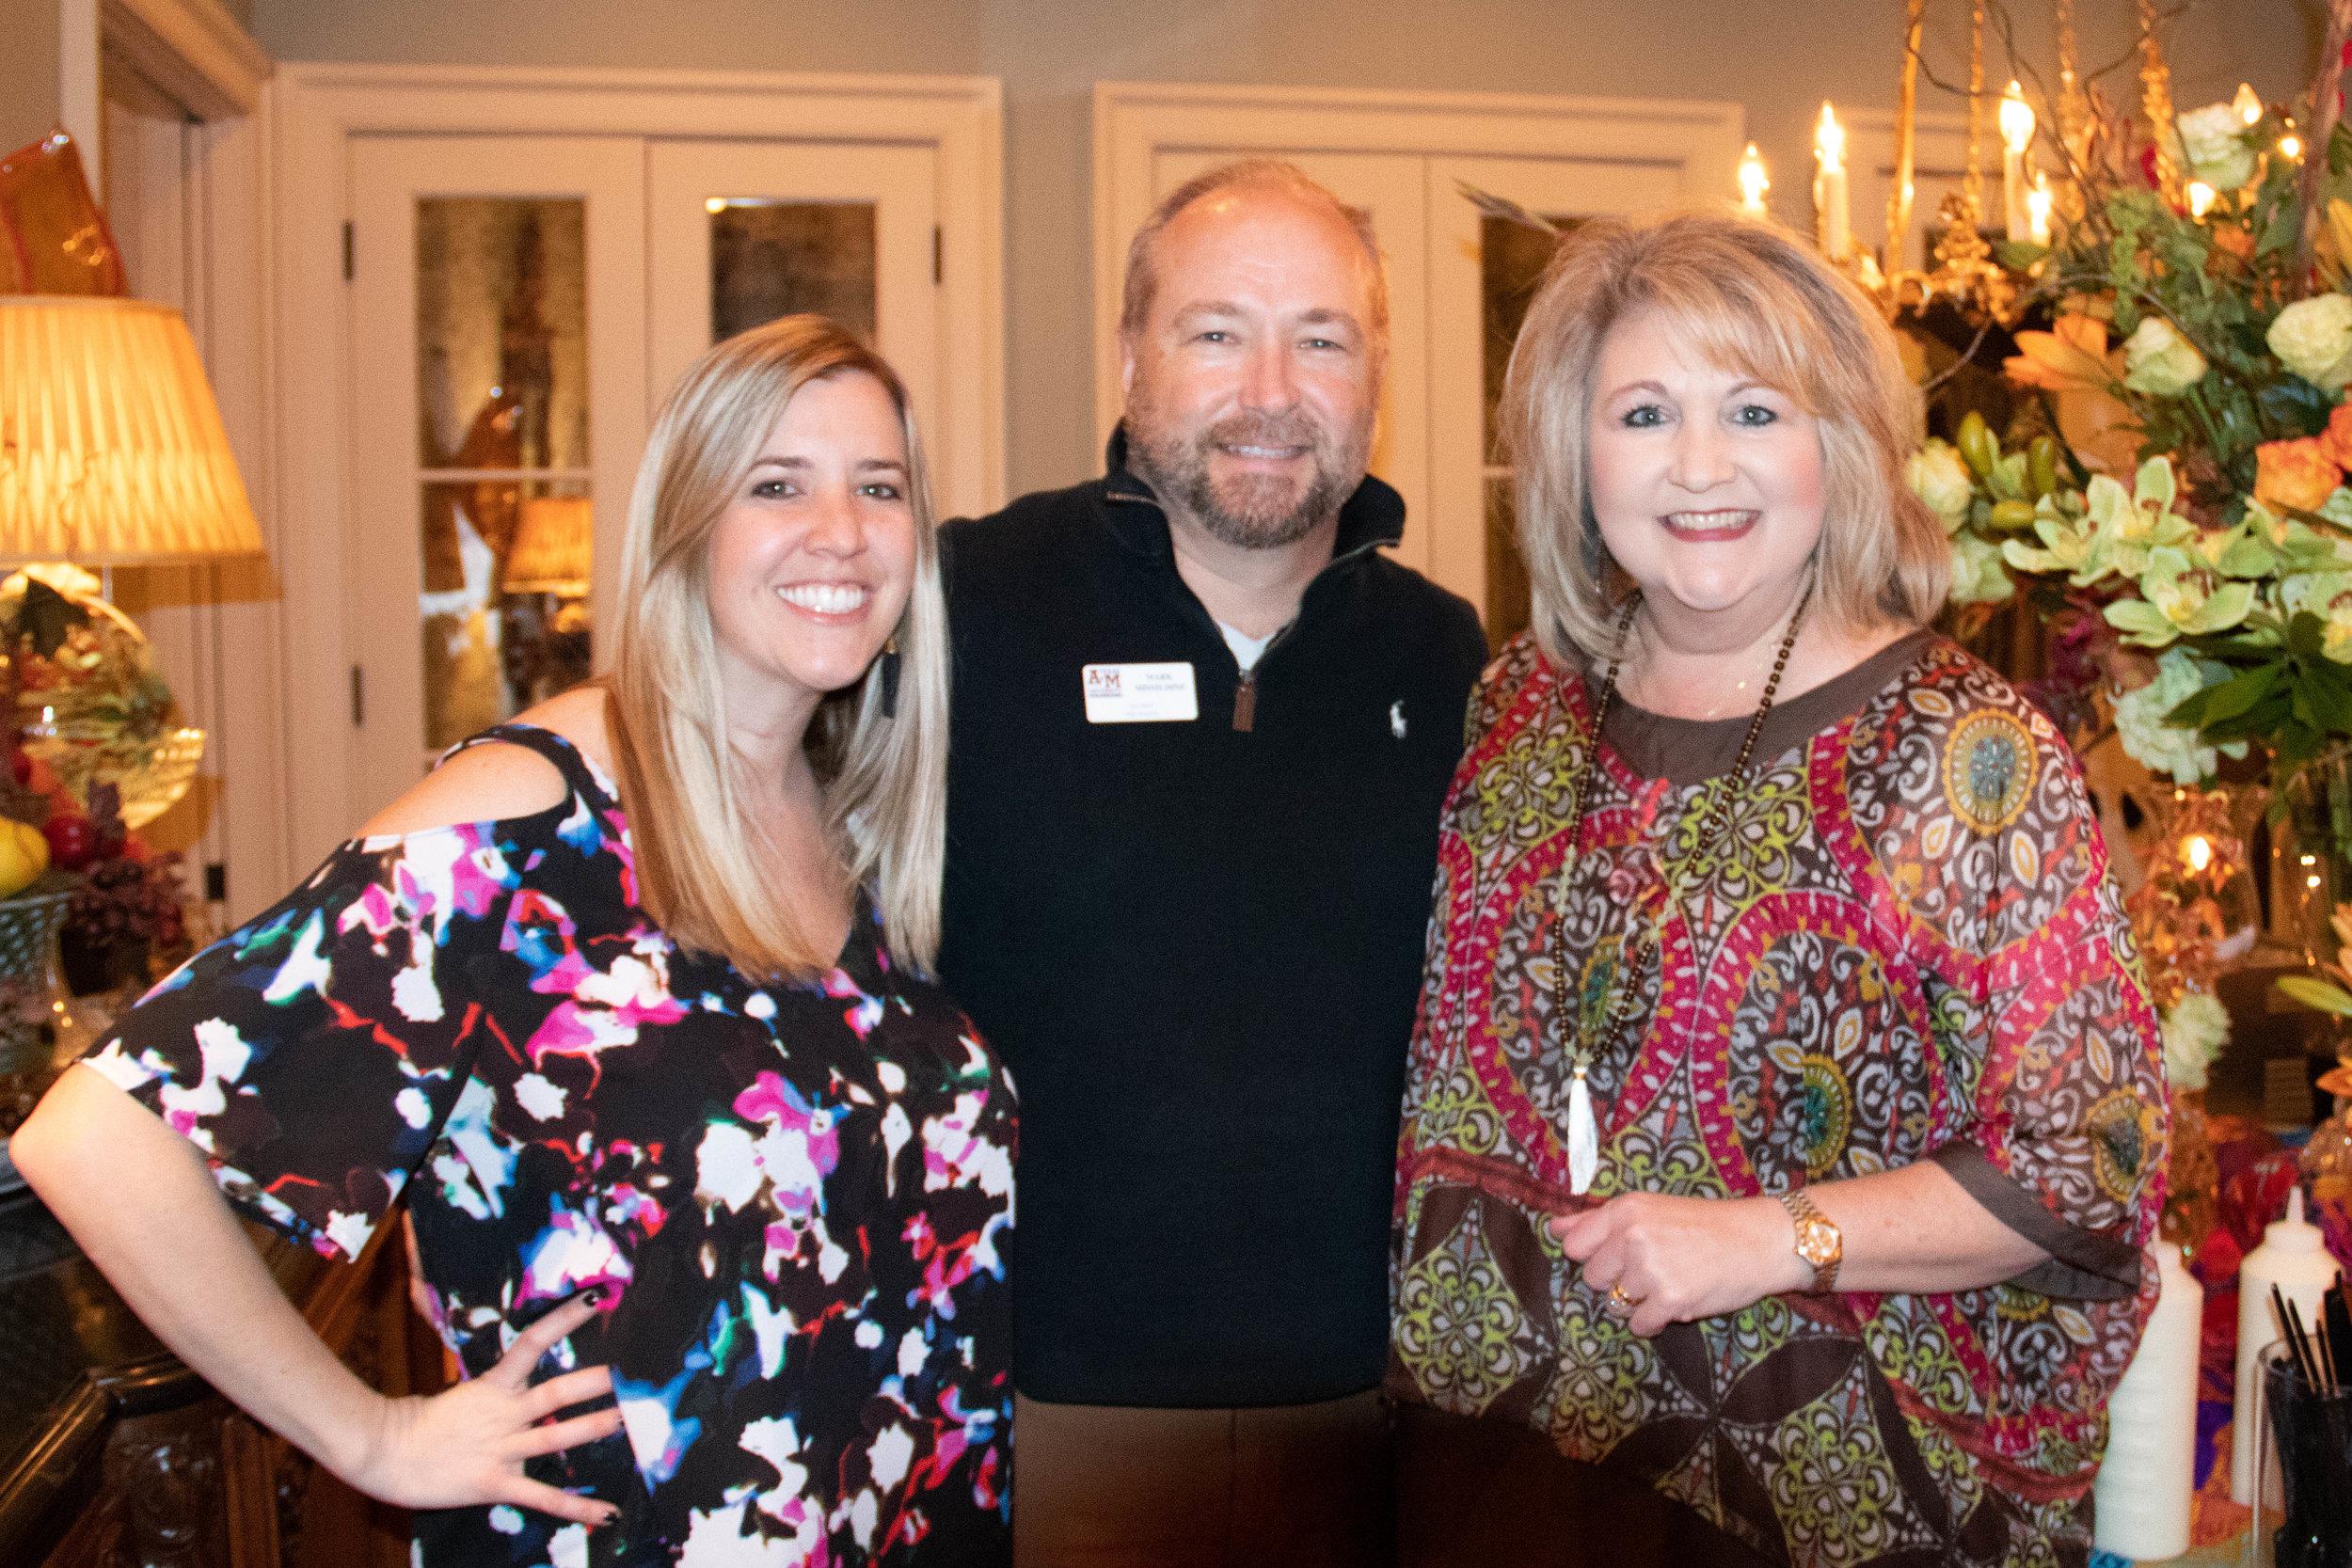 Courtney Boeckmann, Mark Missildine and LeAnne Wright